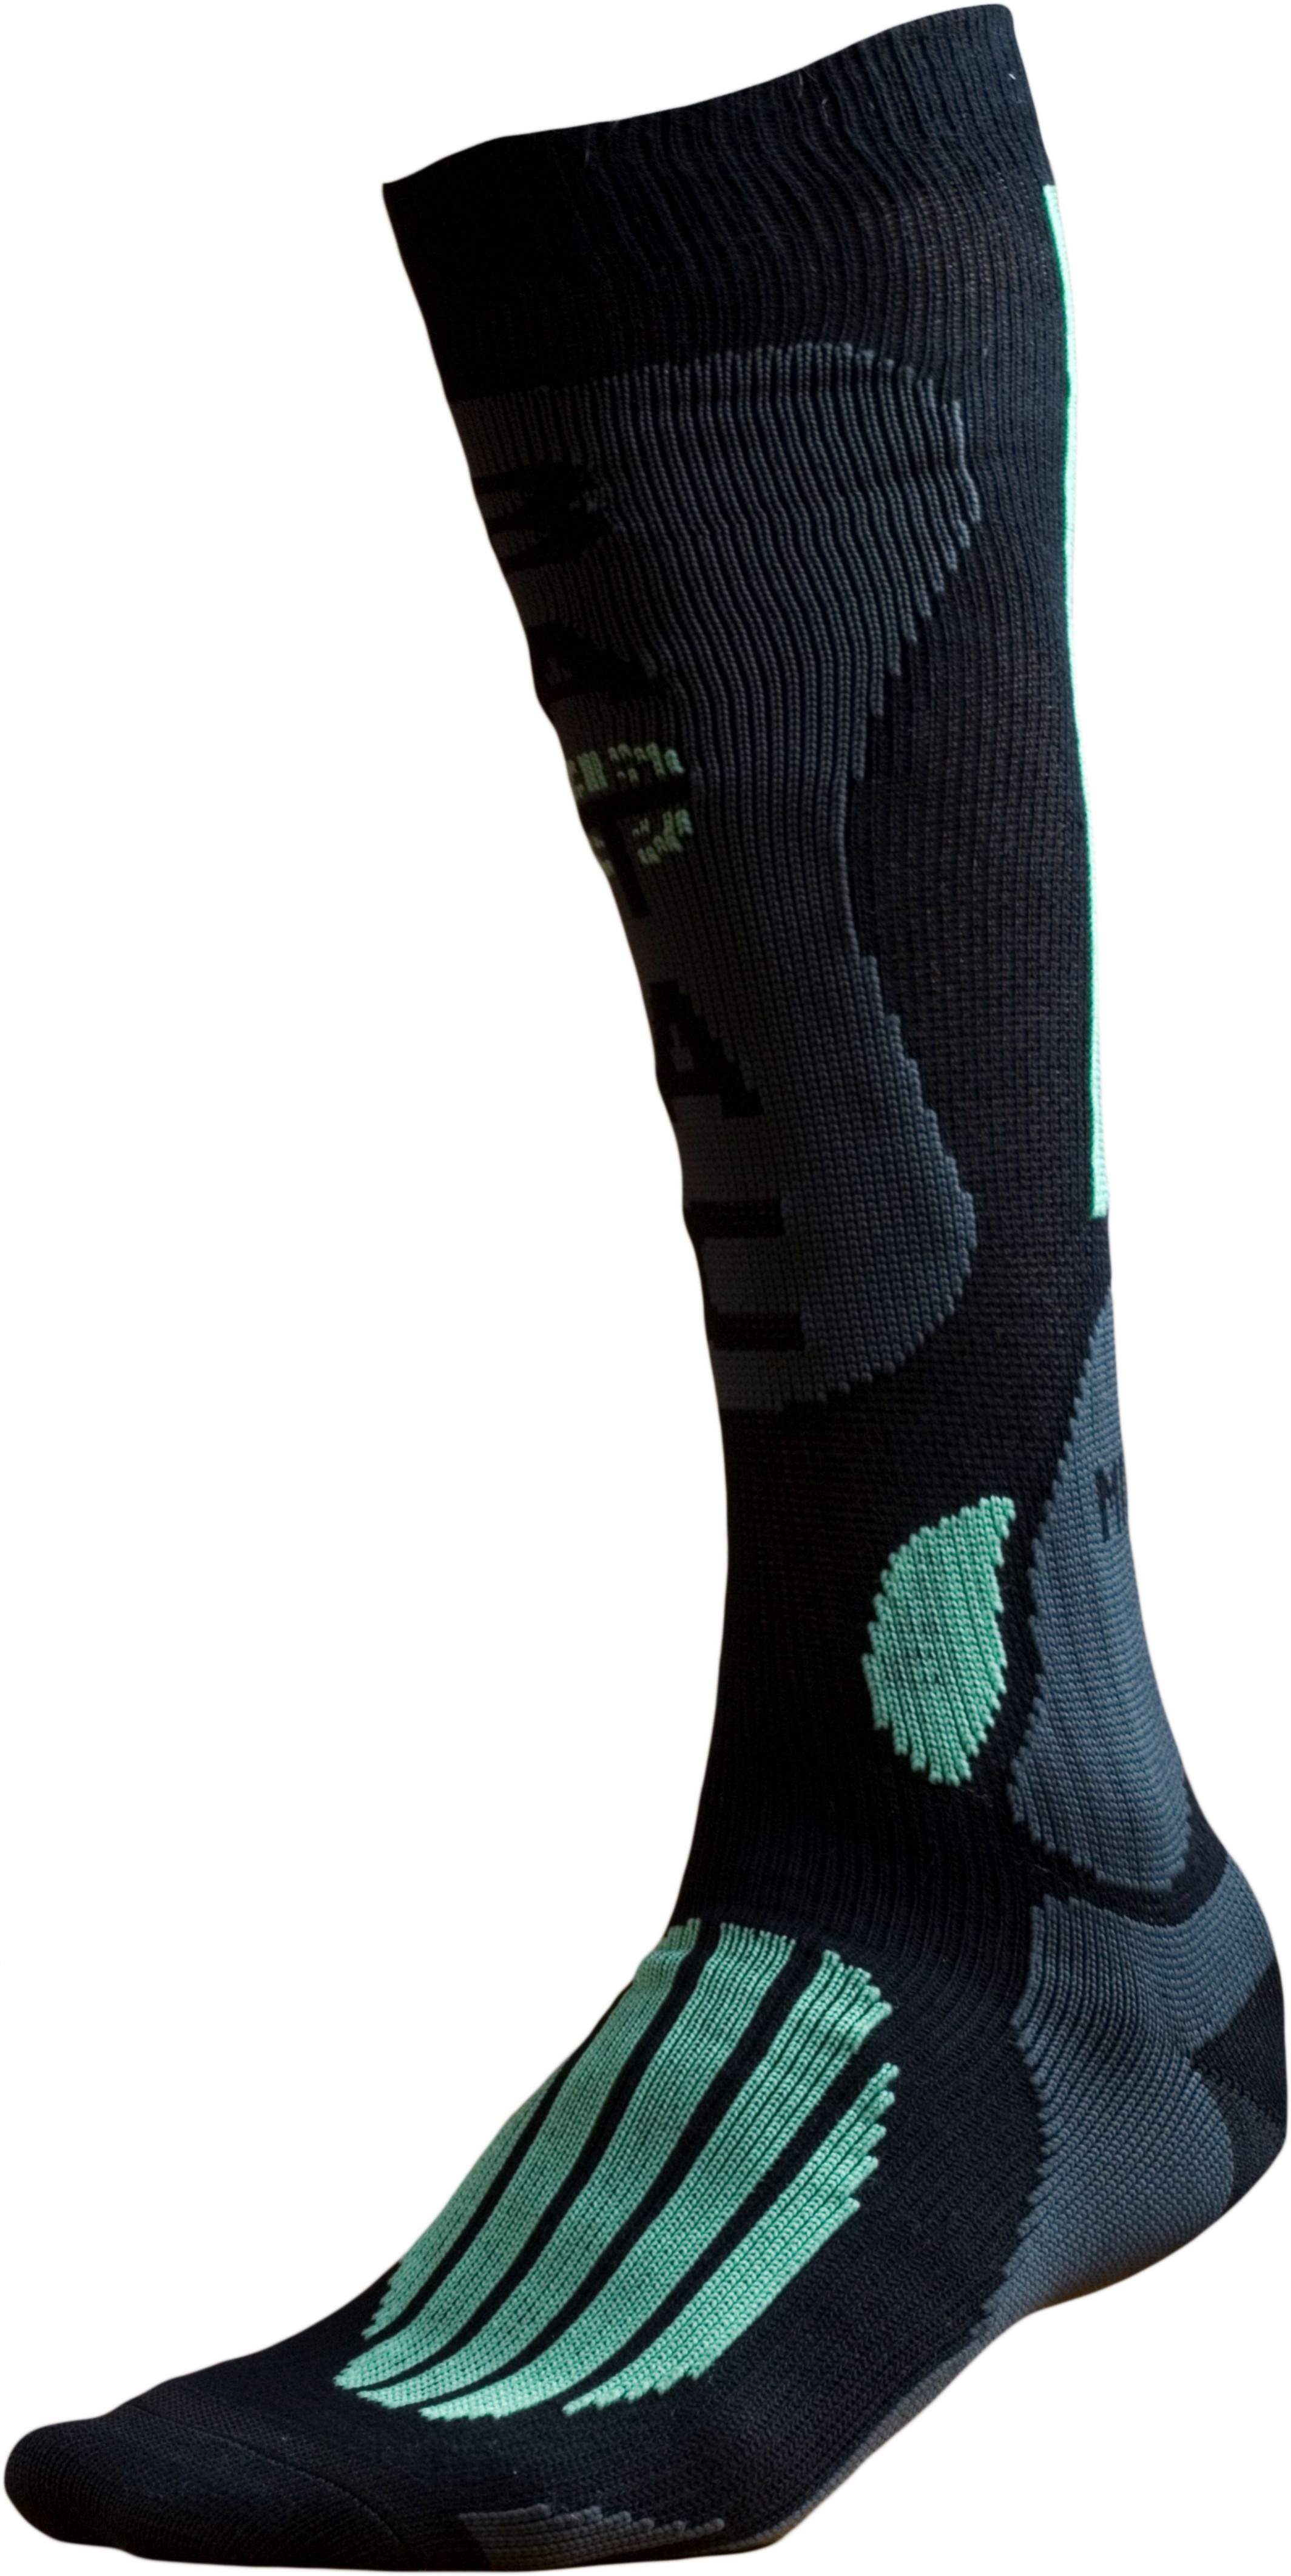 Ponožky BATAC Mission MI01 vel. 34-35 - black/green